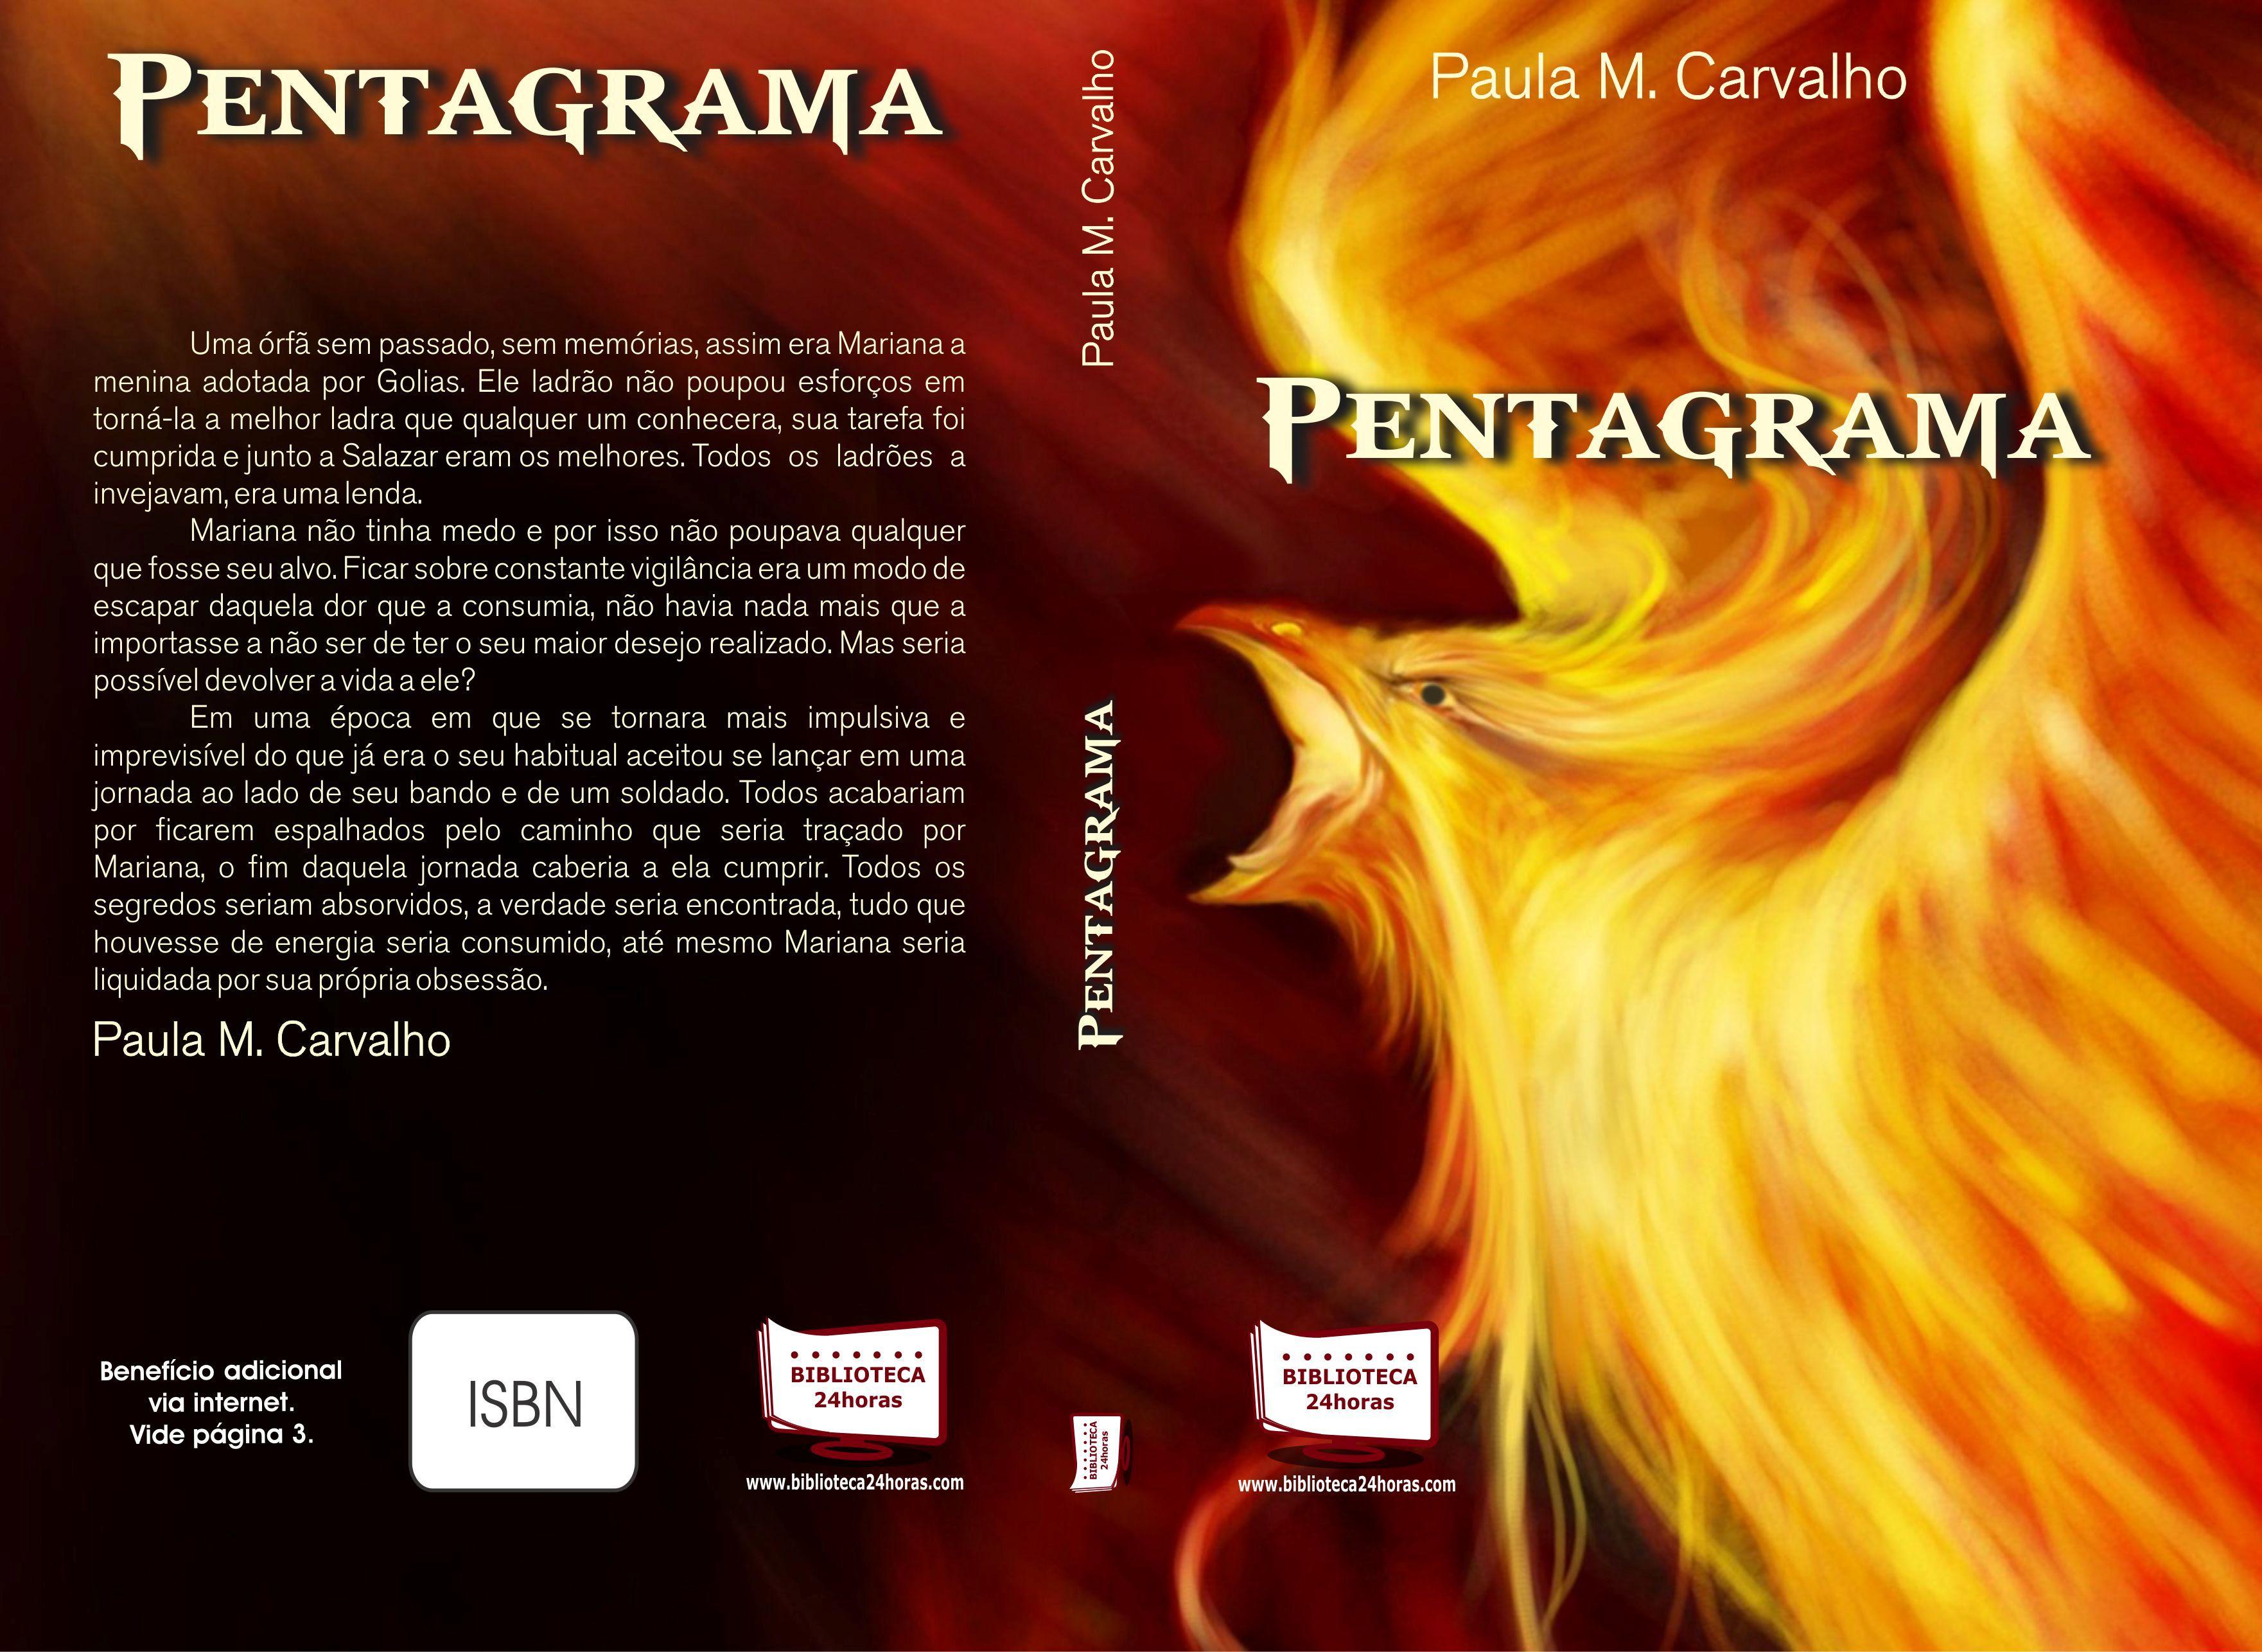 Capa_pentagrama_paula_carvalho (2)